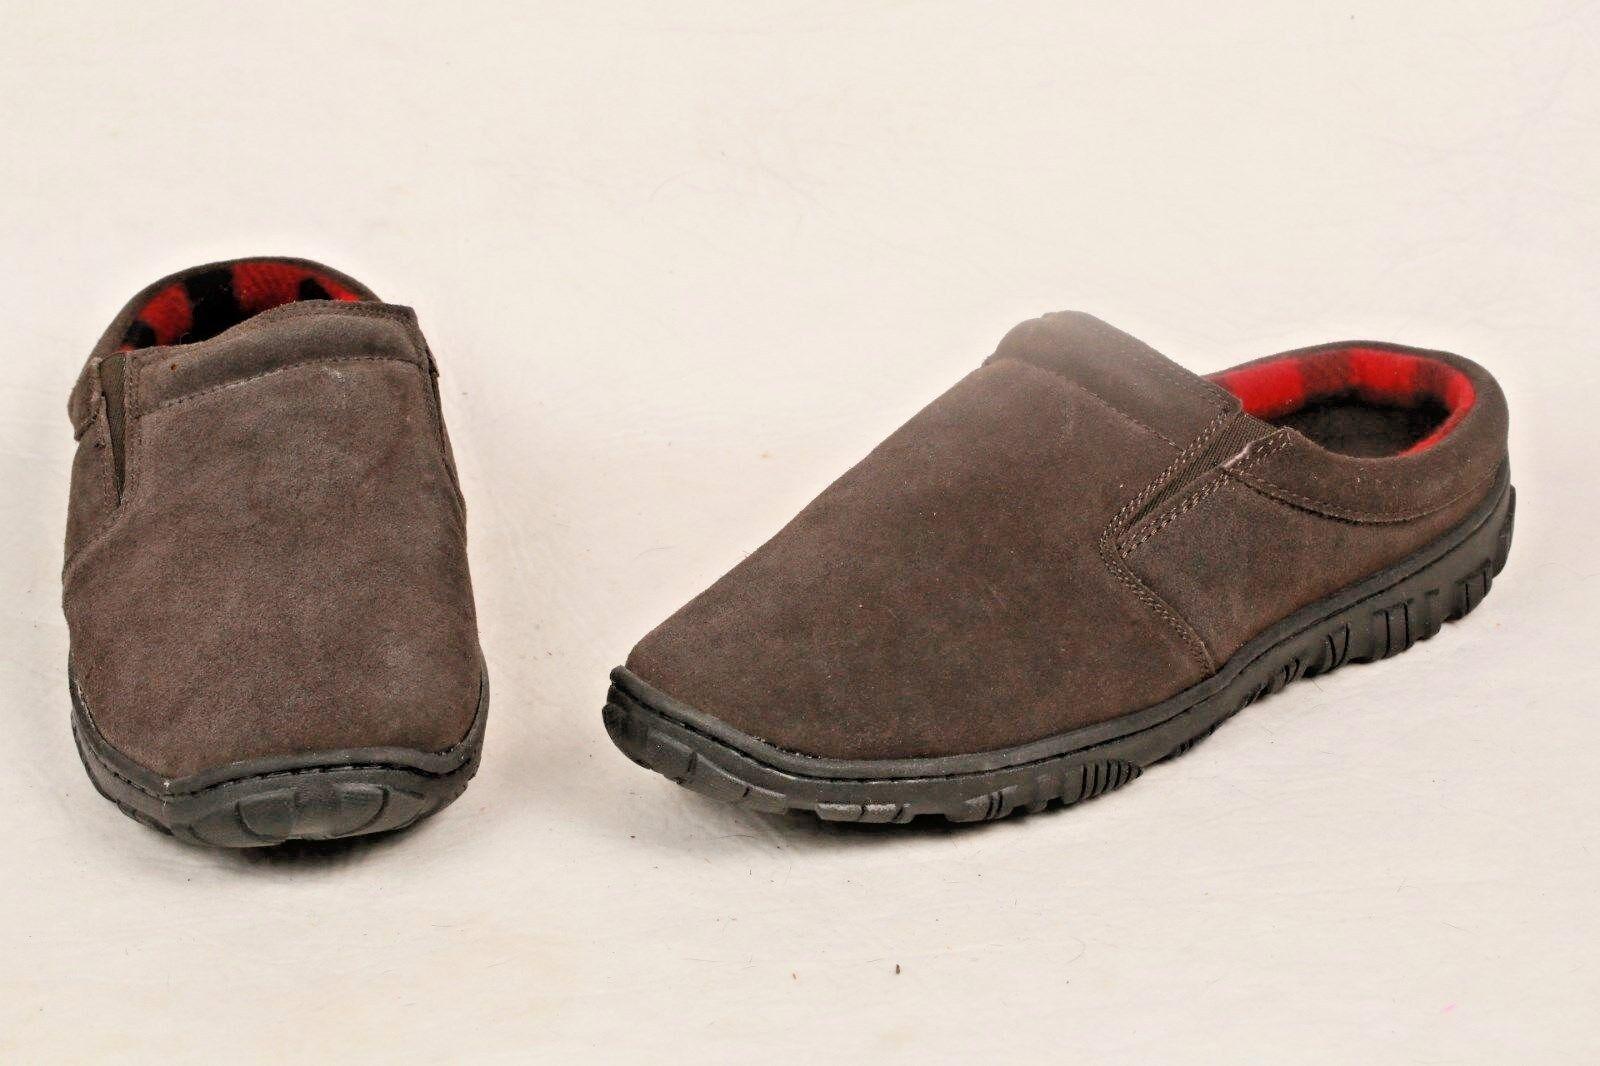 CLARKS NEW Clog Casual Men Shoe Leather Suede Brown 11 Buffalo Plaid Fleece Line